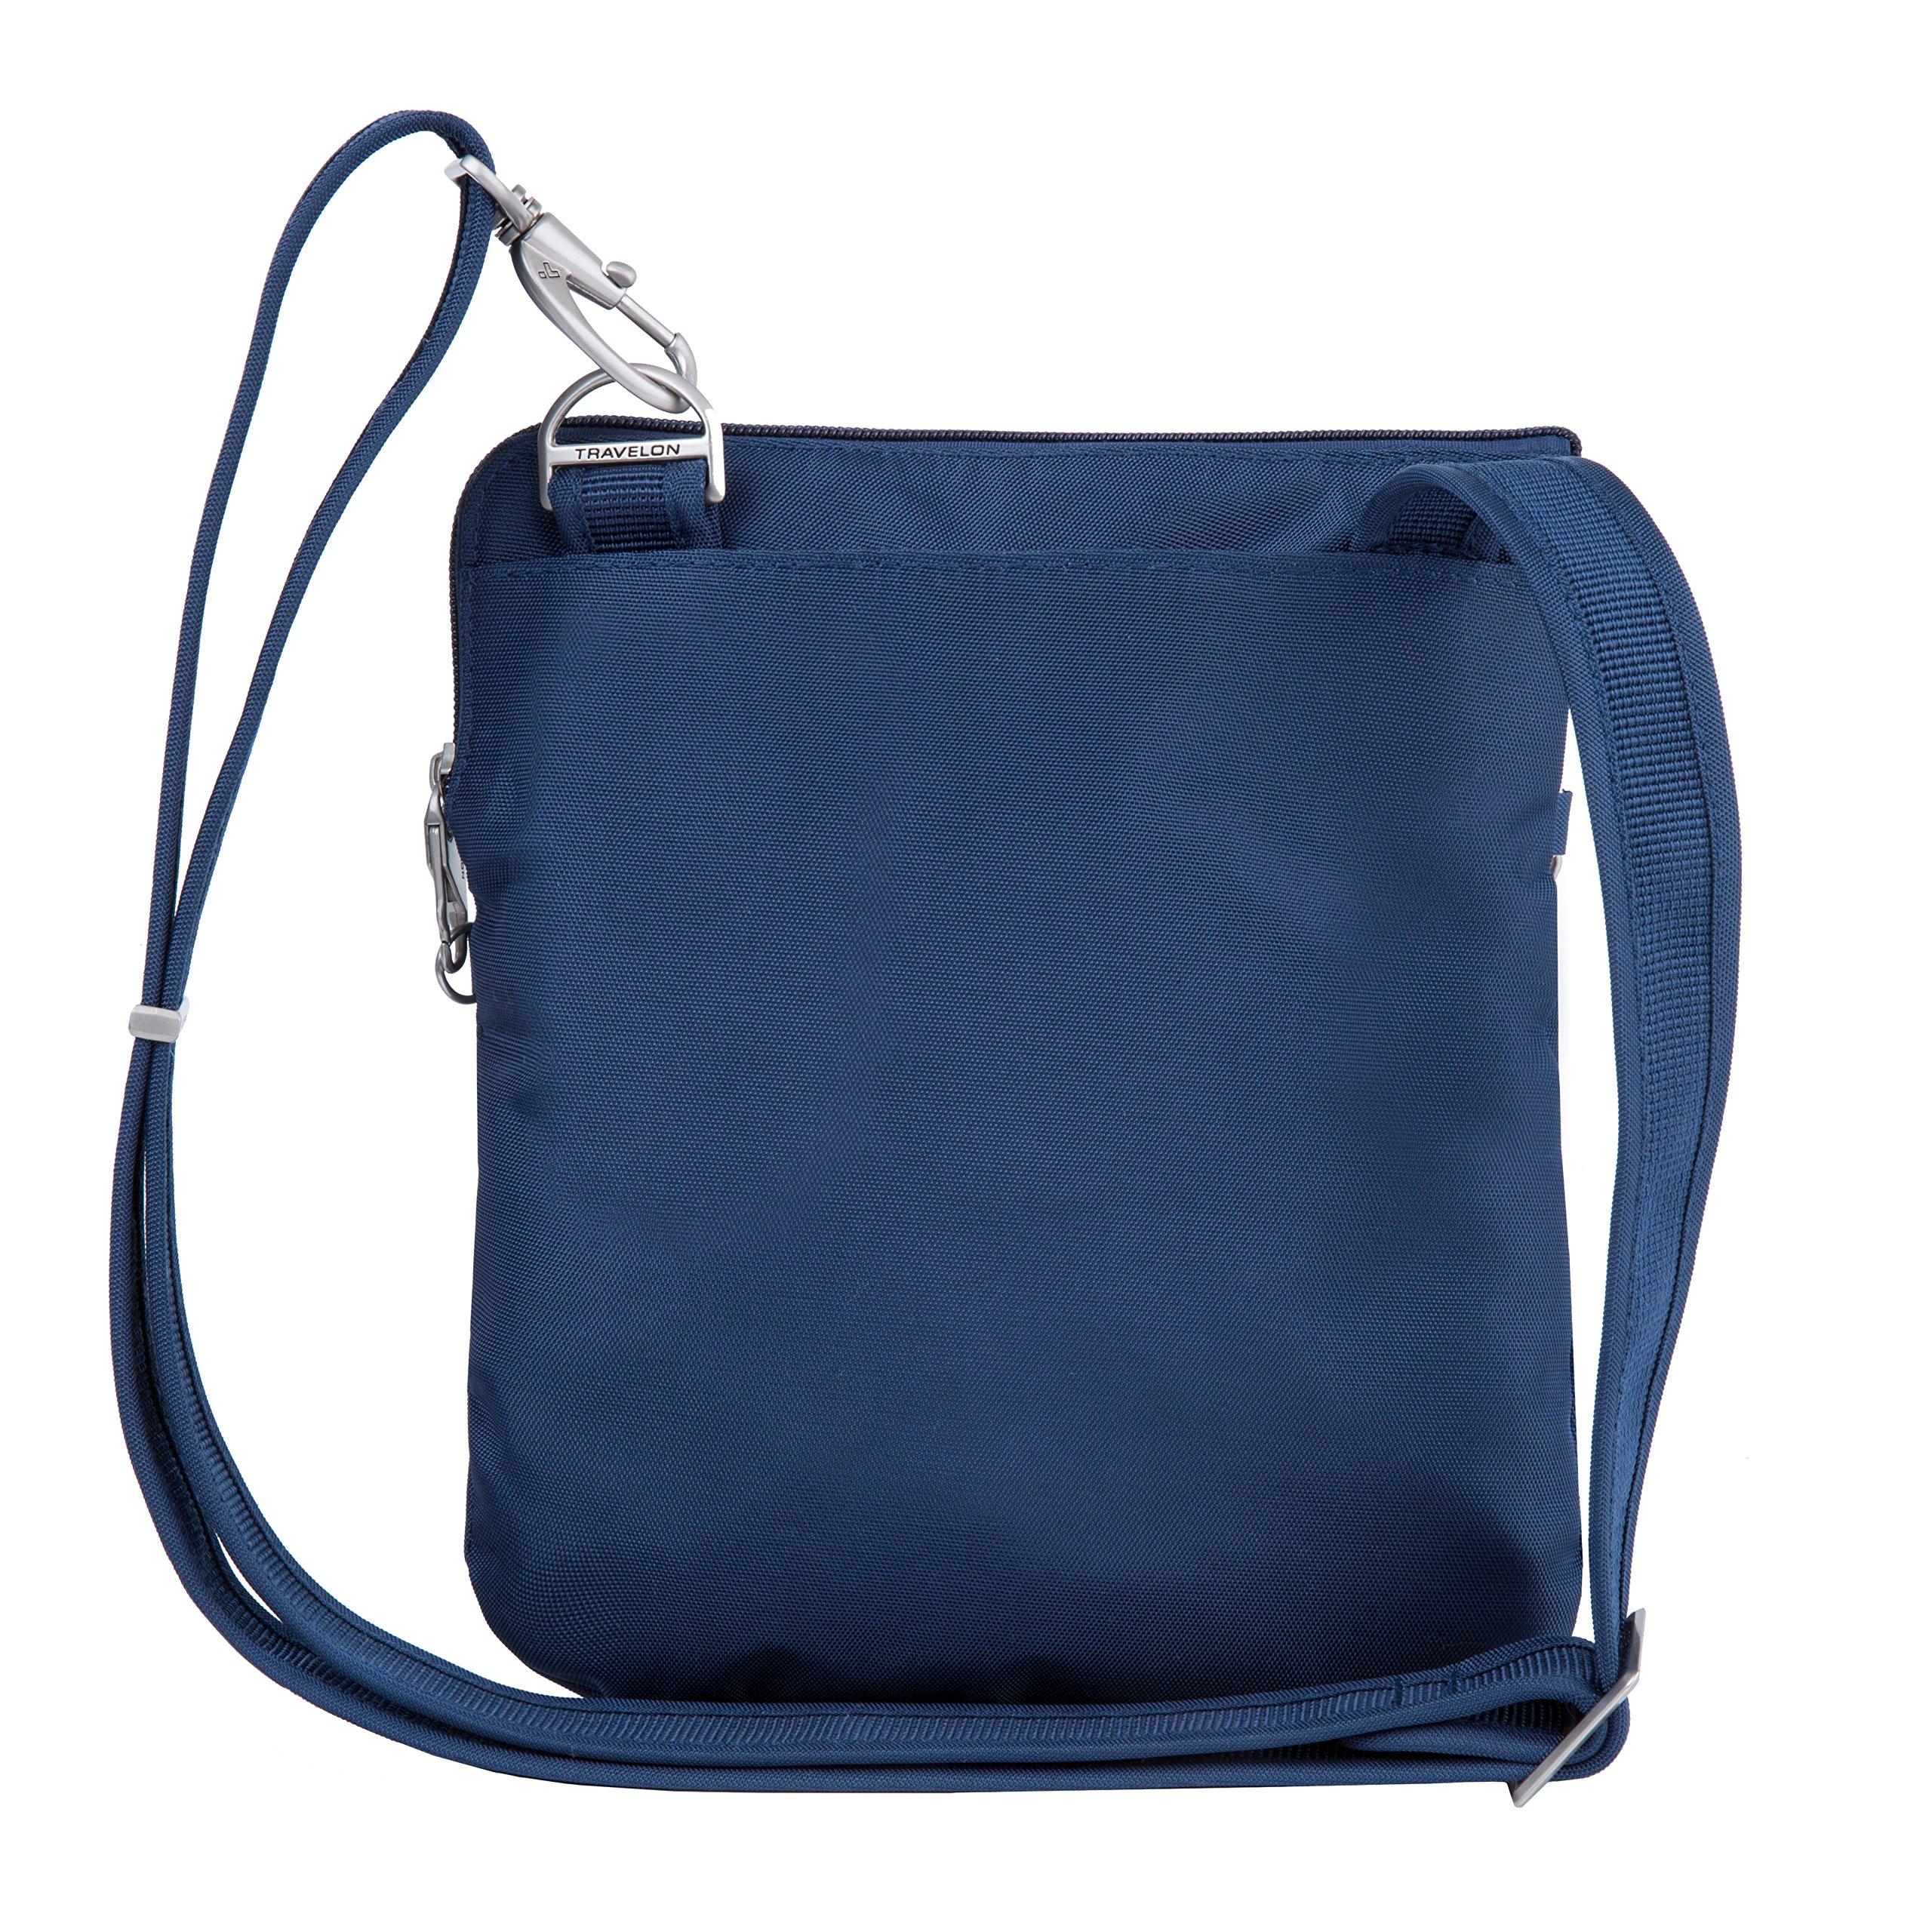 Travelon Anti-Theft Classic Slim Dbl Zip Crossbody Bag, Midnight by Travelon (Image #9)